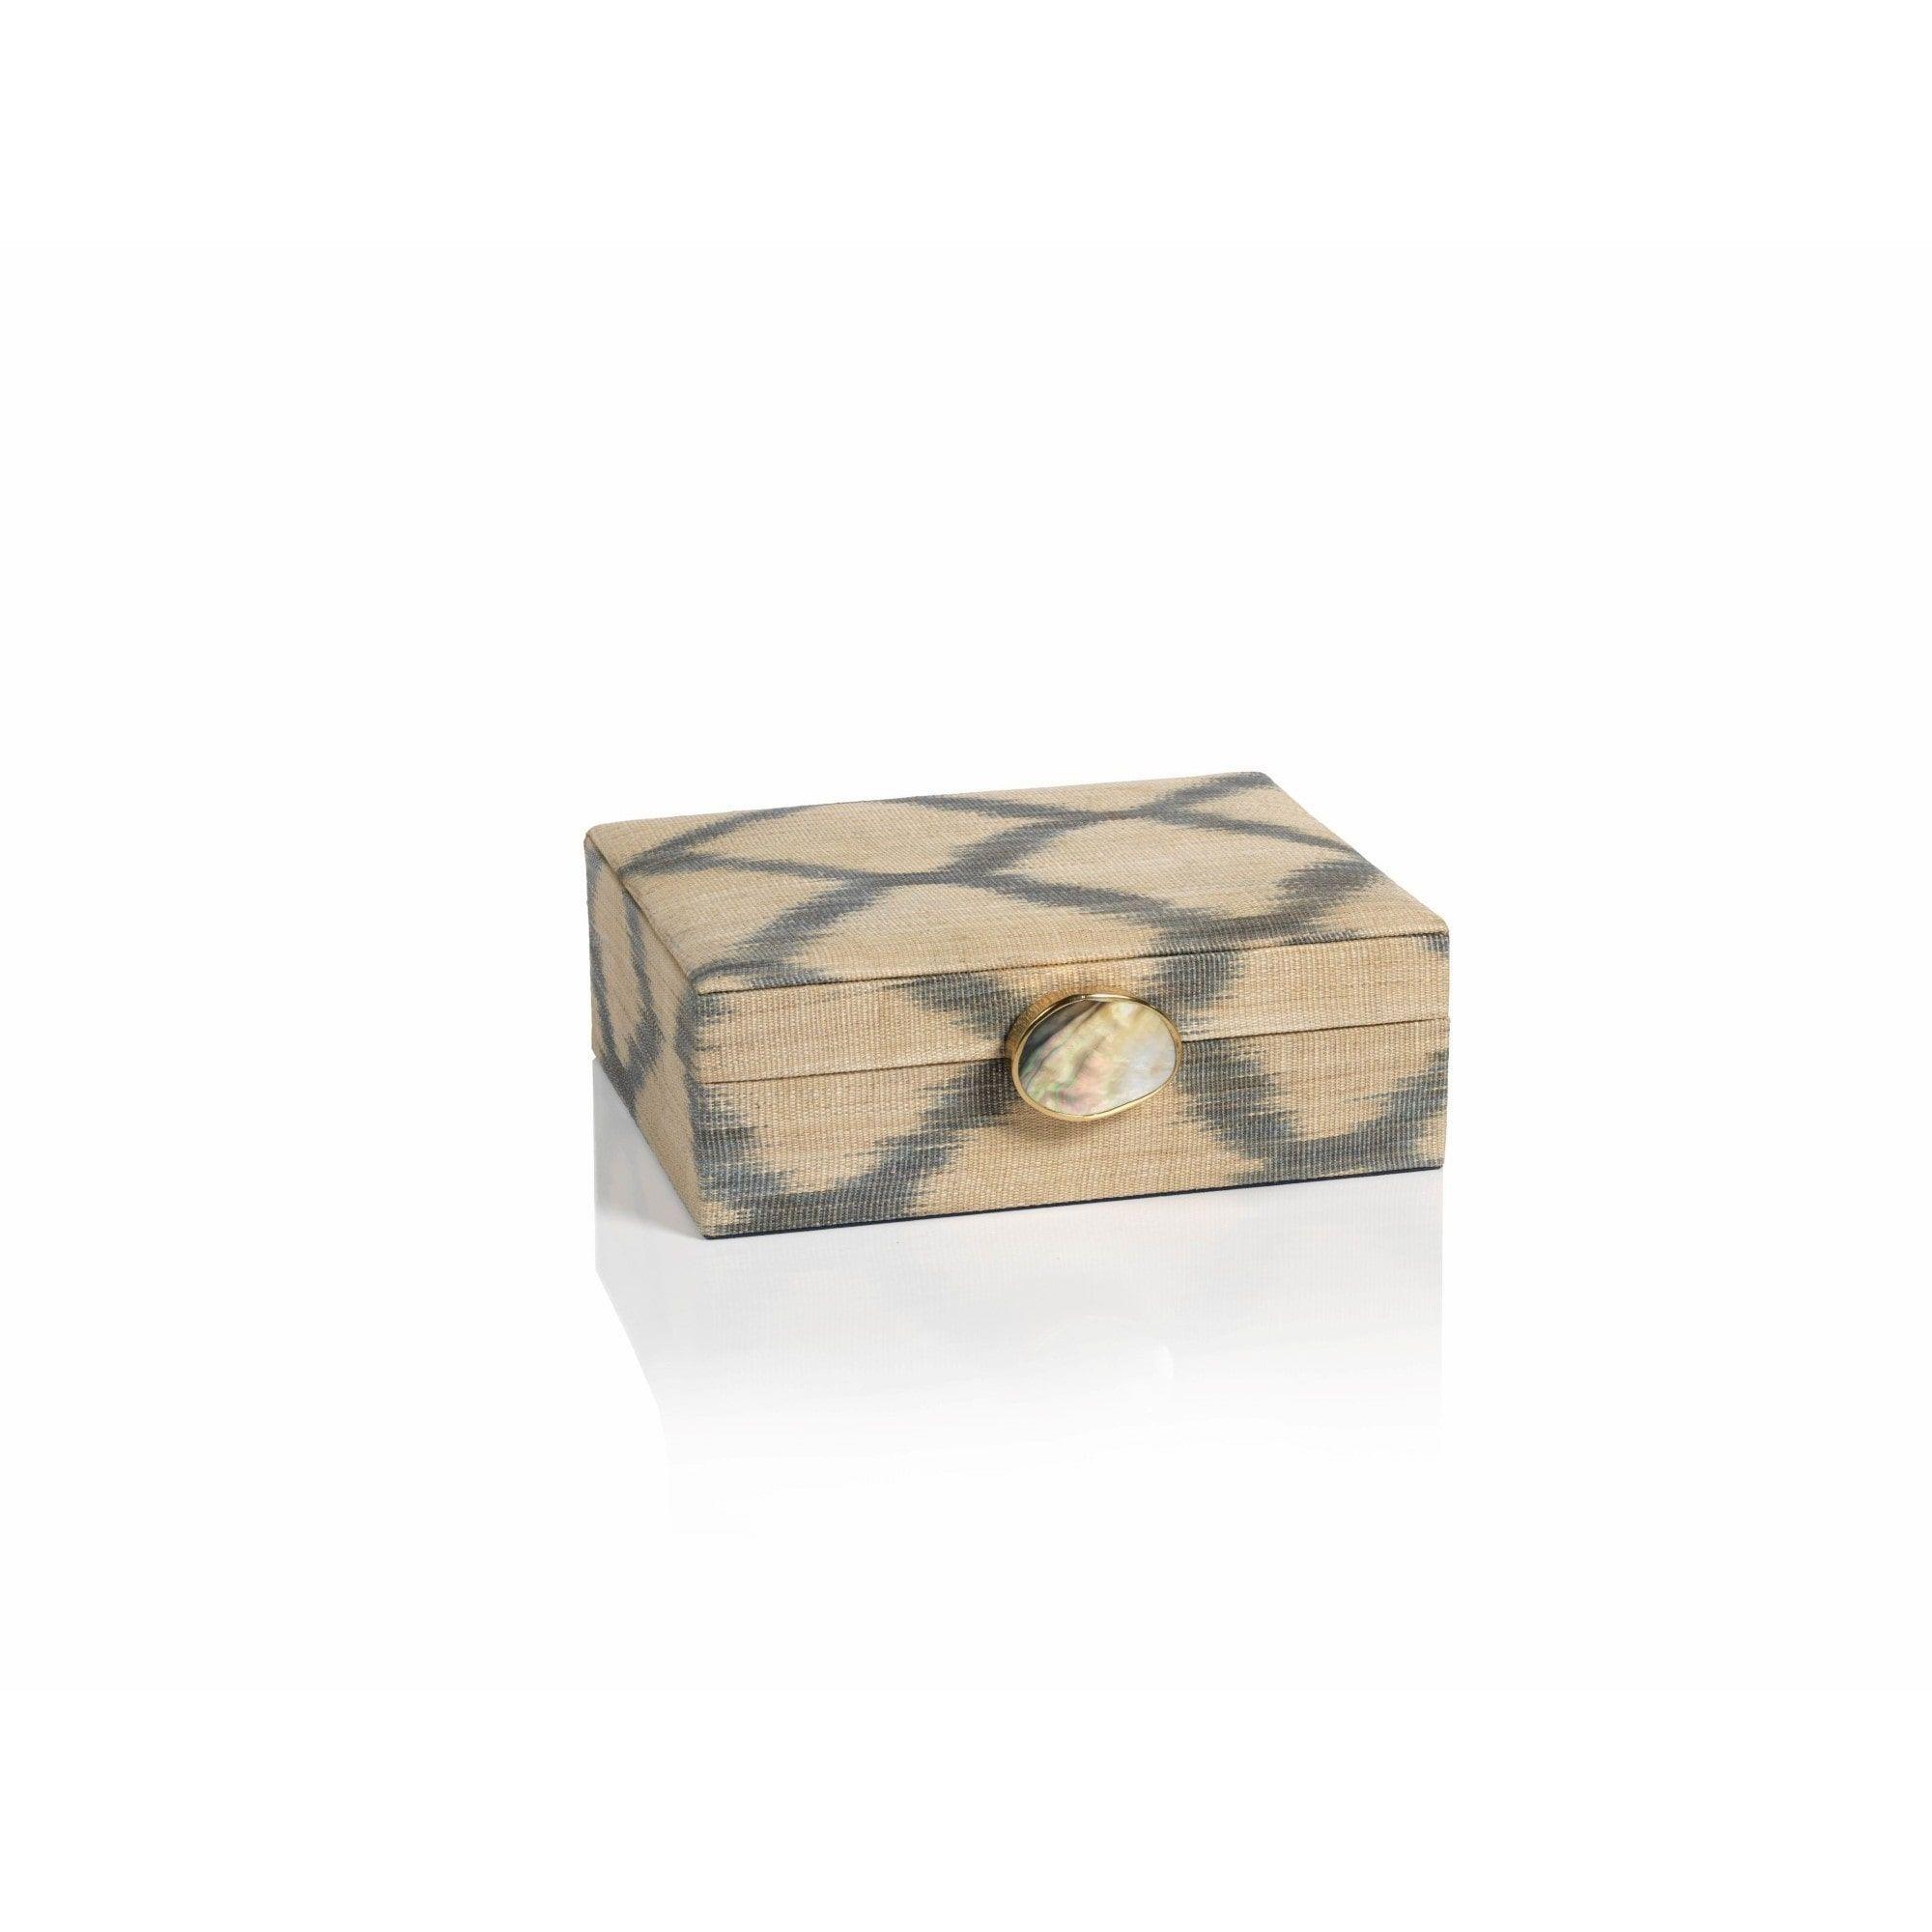 Decorative Photo Boxes Zodax 9Inch Long Ikat Decorative Storage Box With Shell & Brass